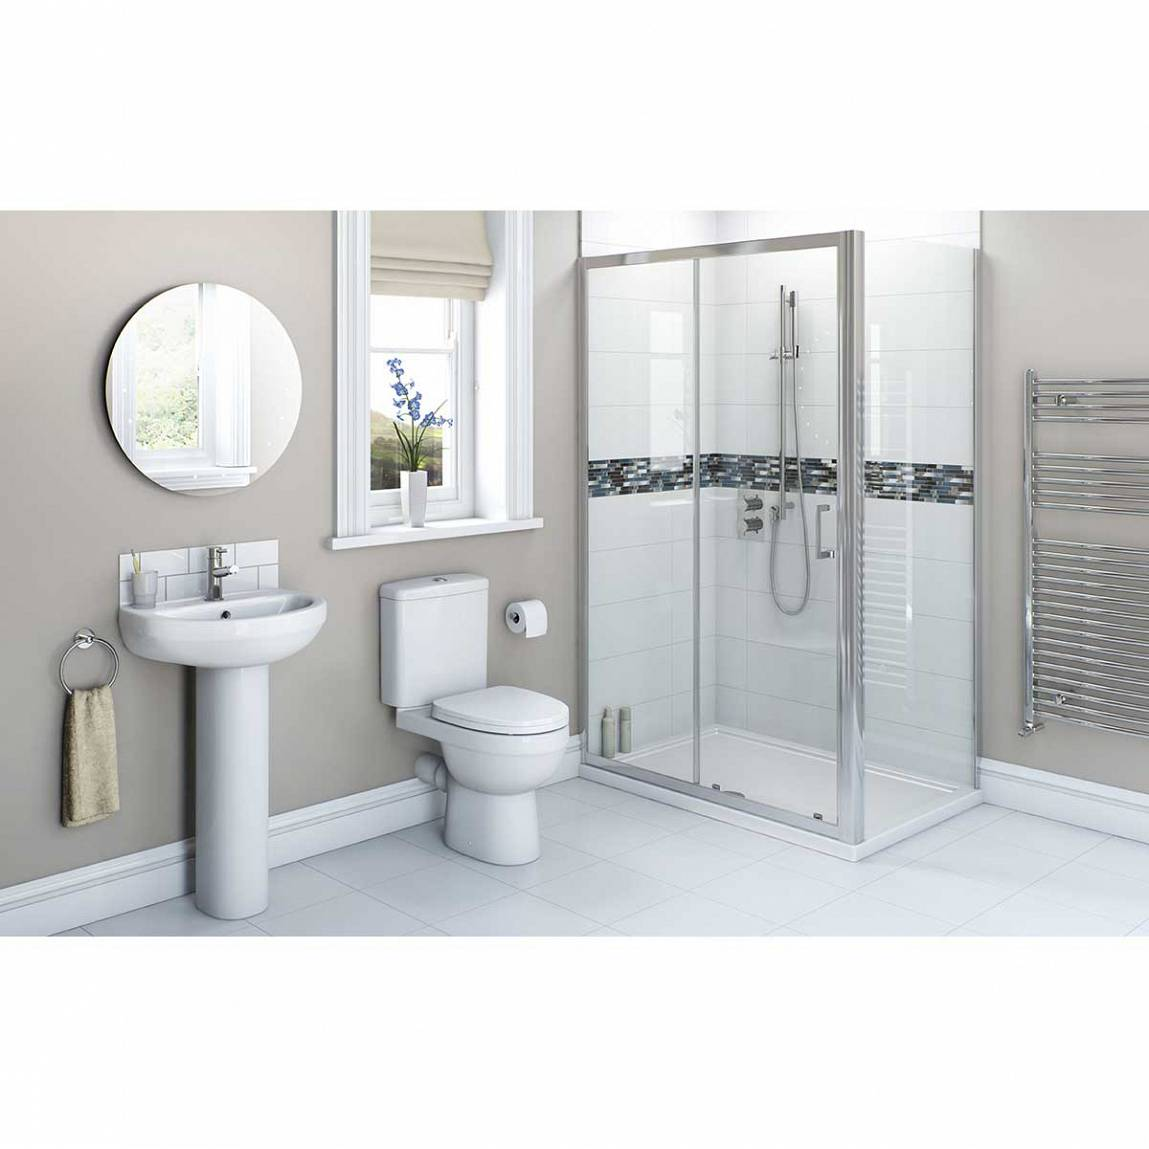 Image of Energy Bathroom set with 1600x900 Sliding Enclosure